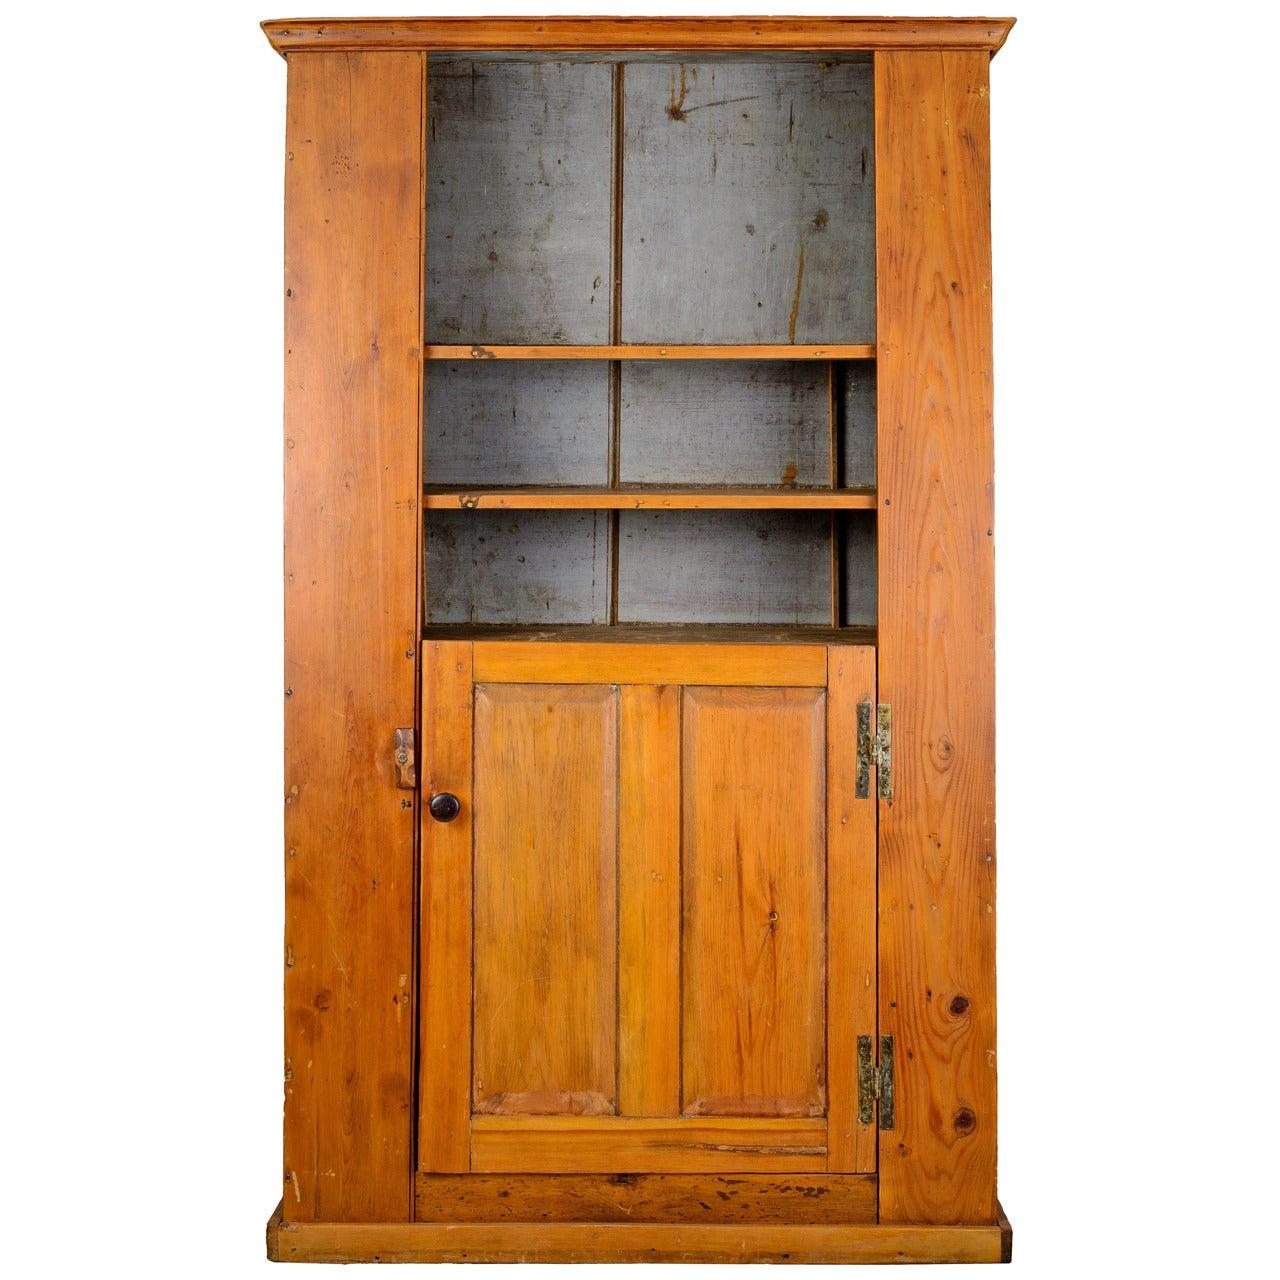 18th Century American Pine Slant Back Cupboard